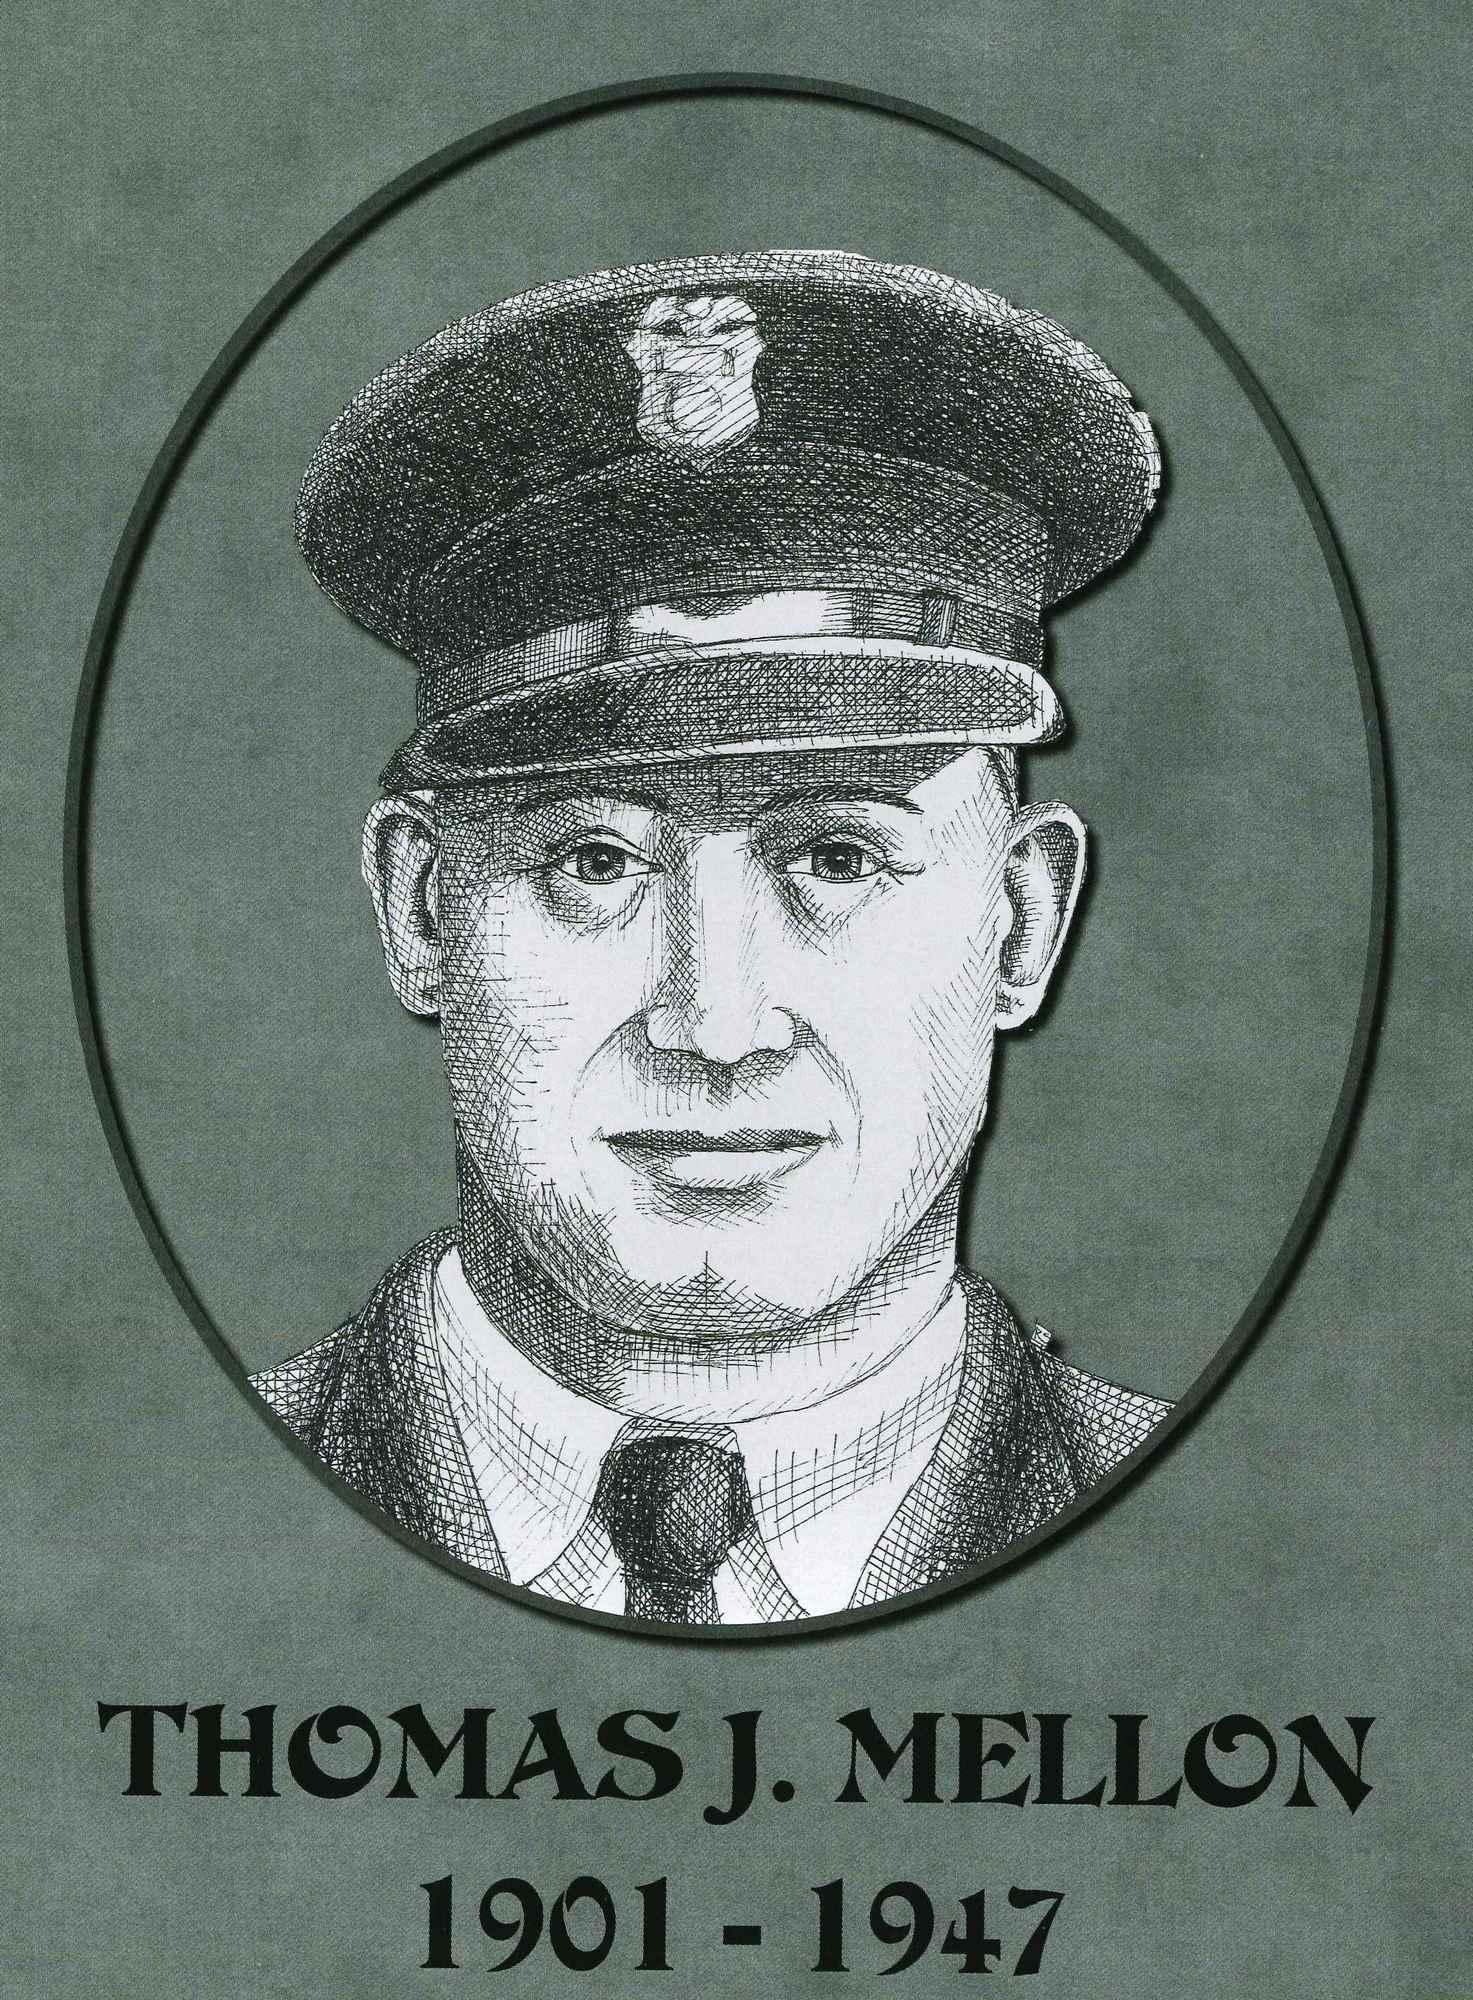 Sketch of Thomas Mellon, killed in 1947.